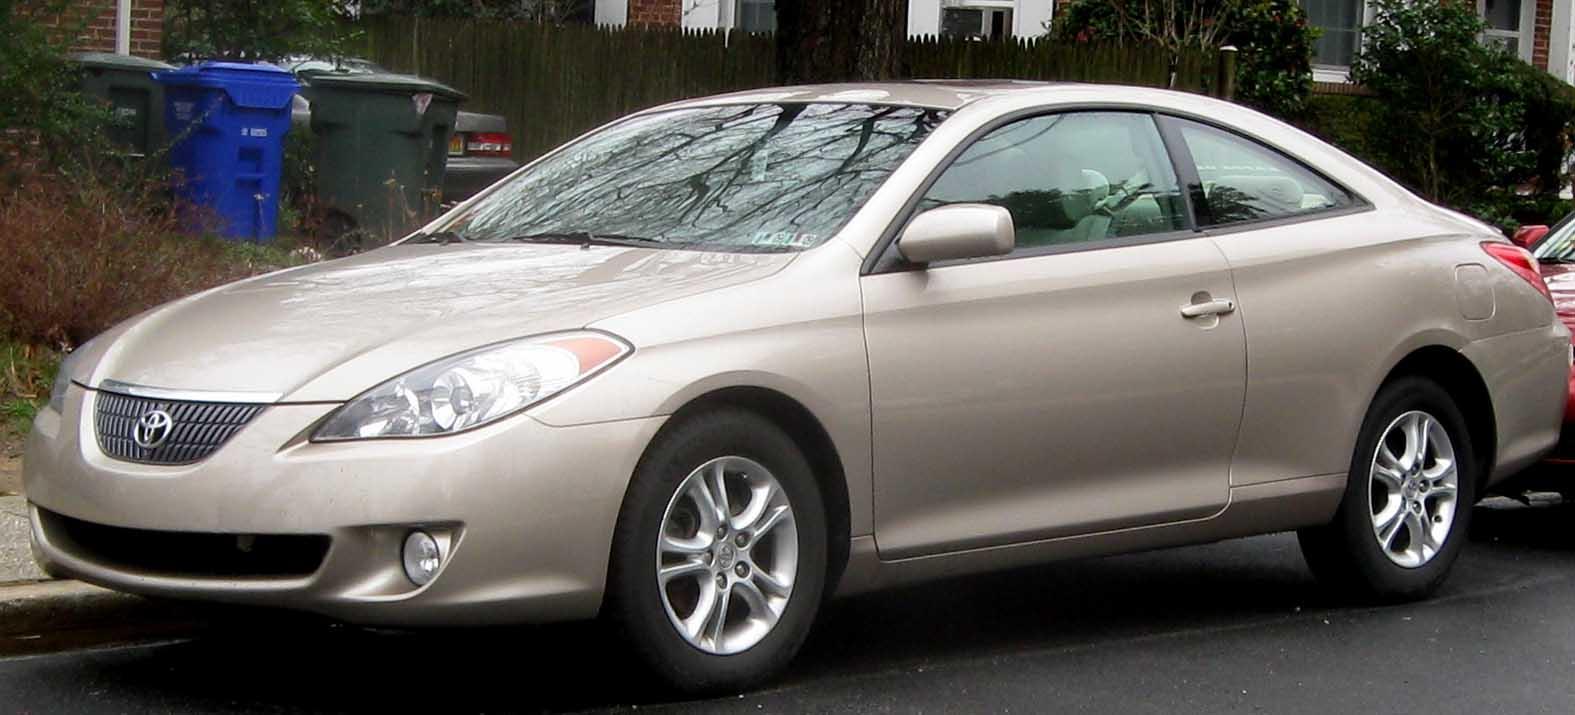 Datei 04 06 Toyota Solara Se Coupe Jpg Wikipedia